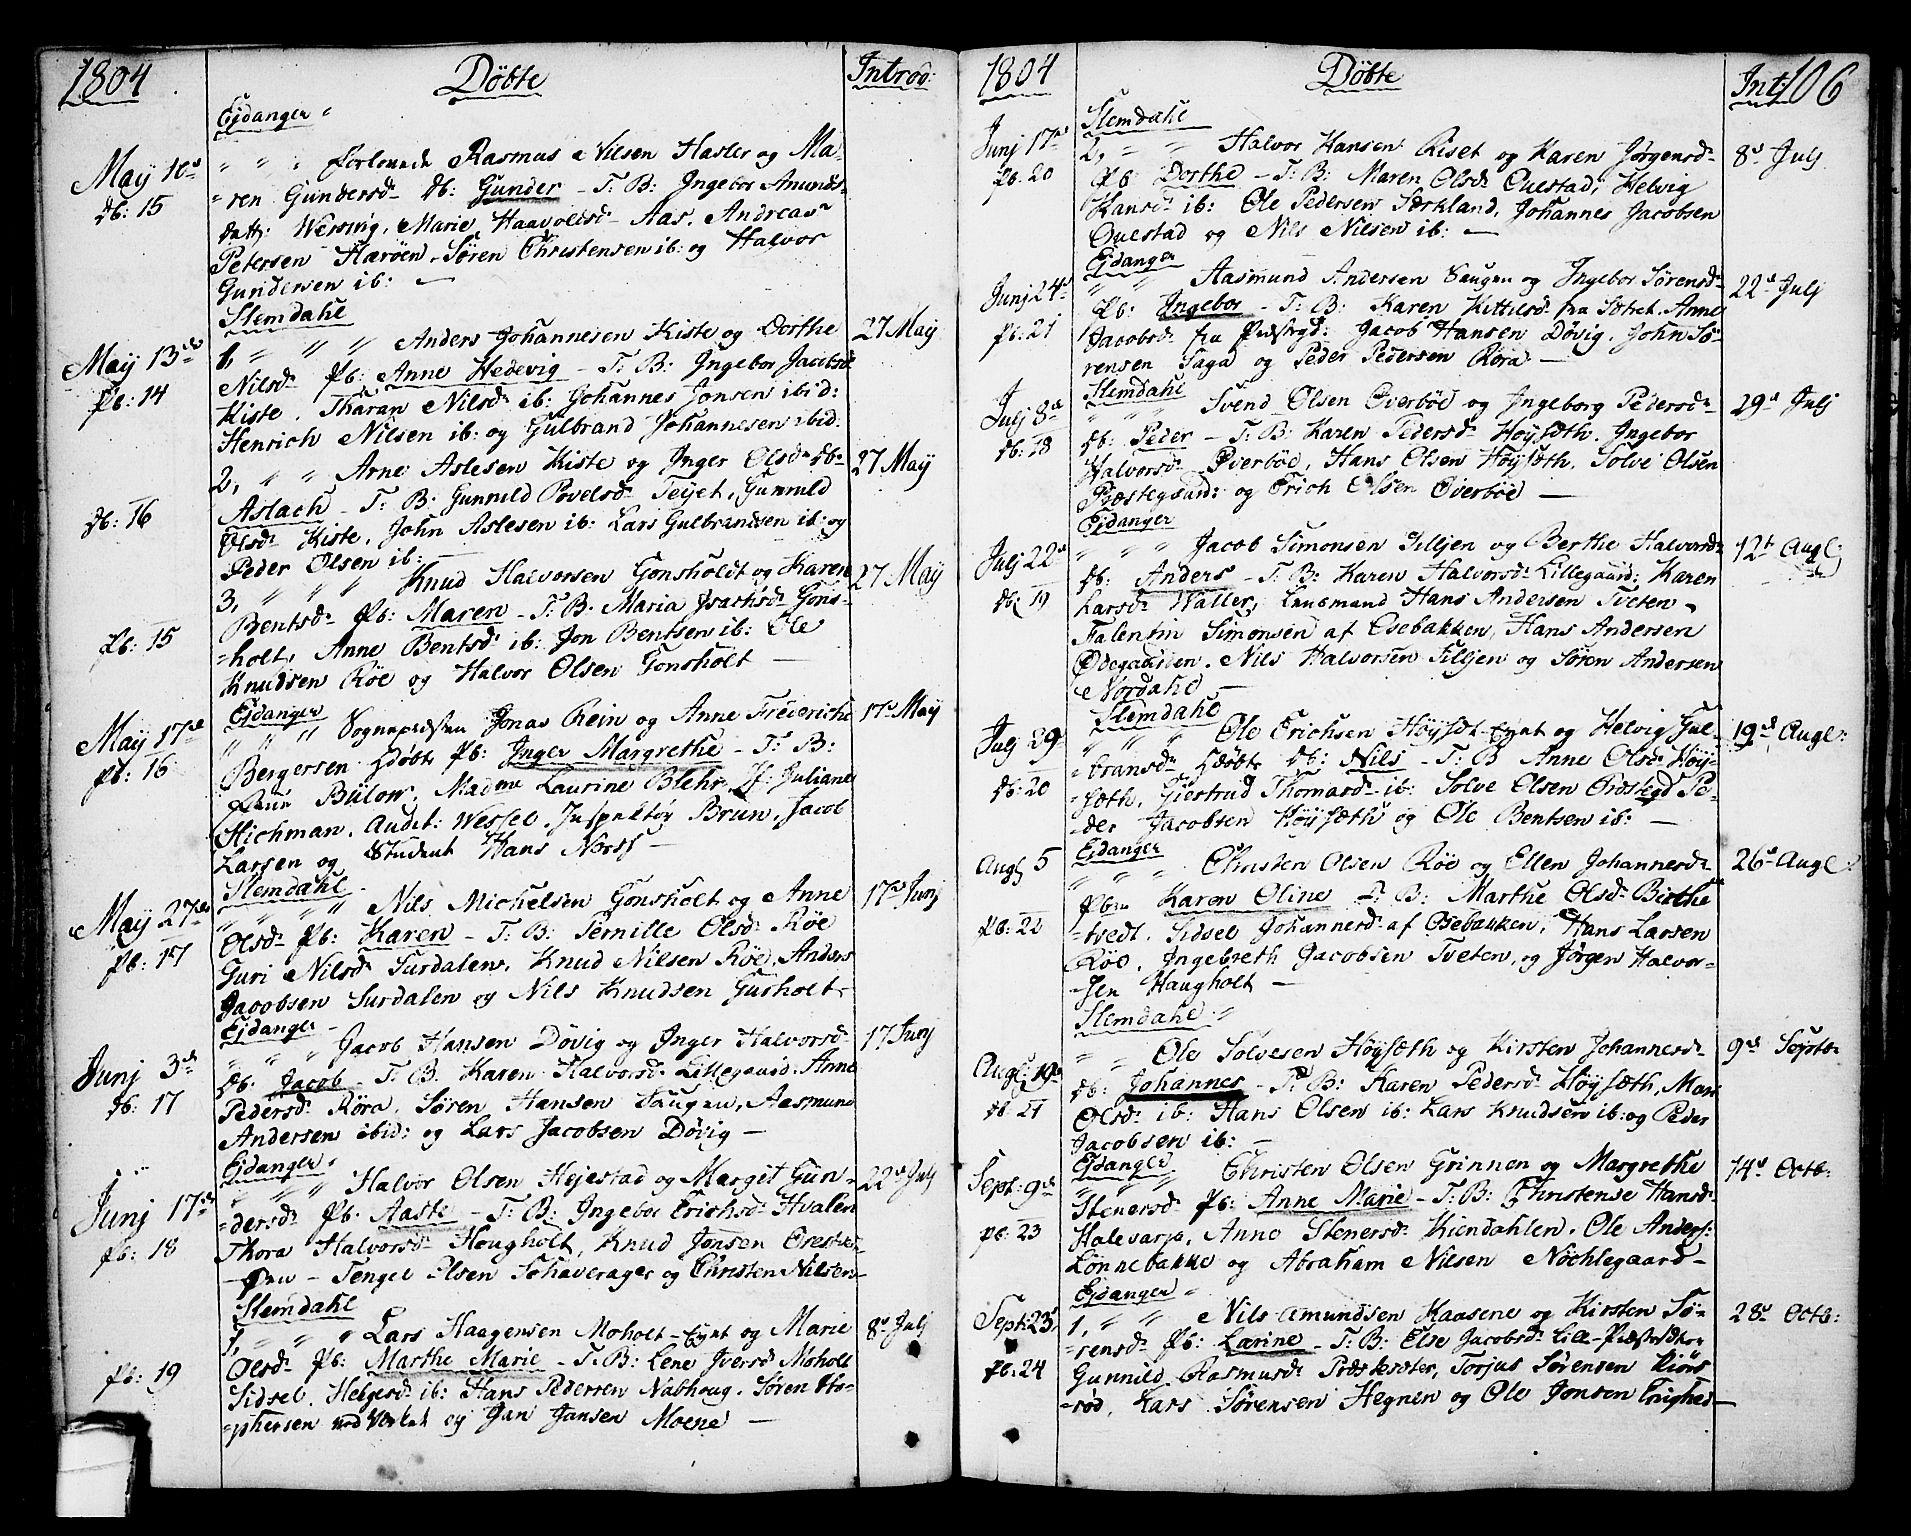 SAKO, Eidanger kirkebøker, F/Fa/L0006: Parish register (official) no. 6, 1764-1814, p. 106